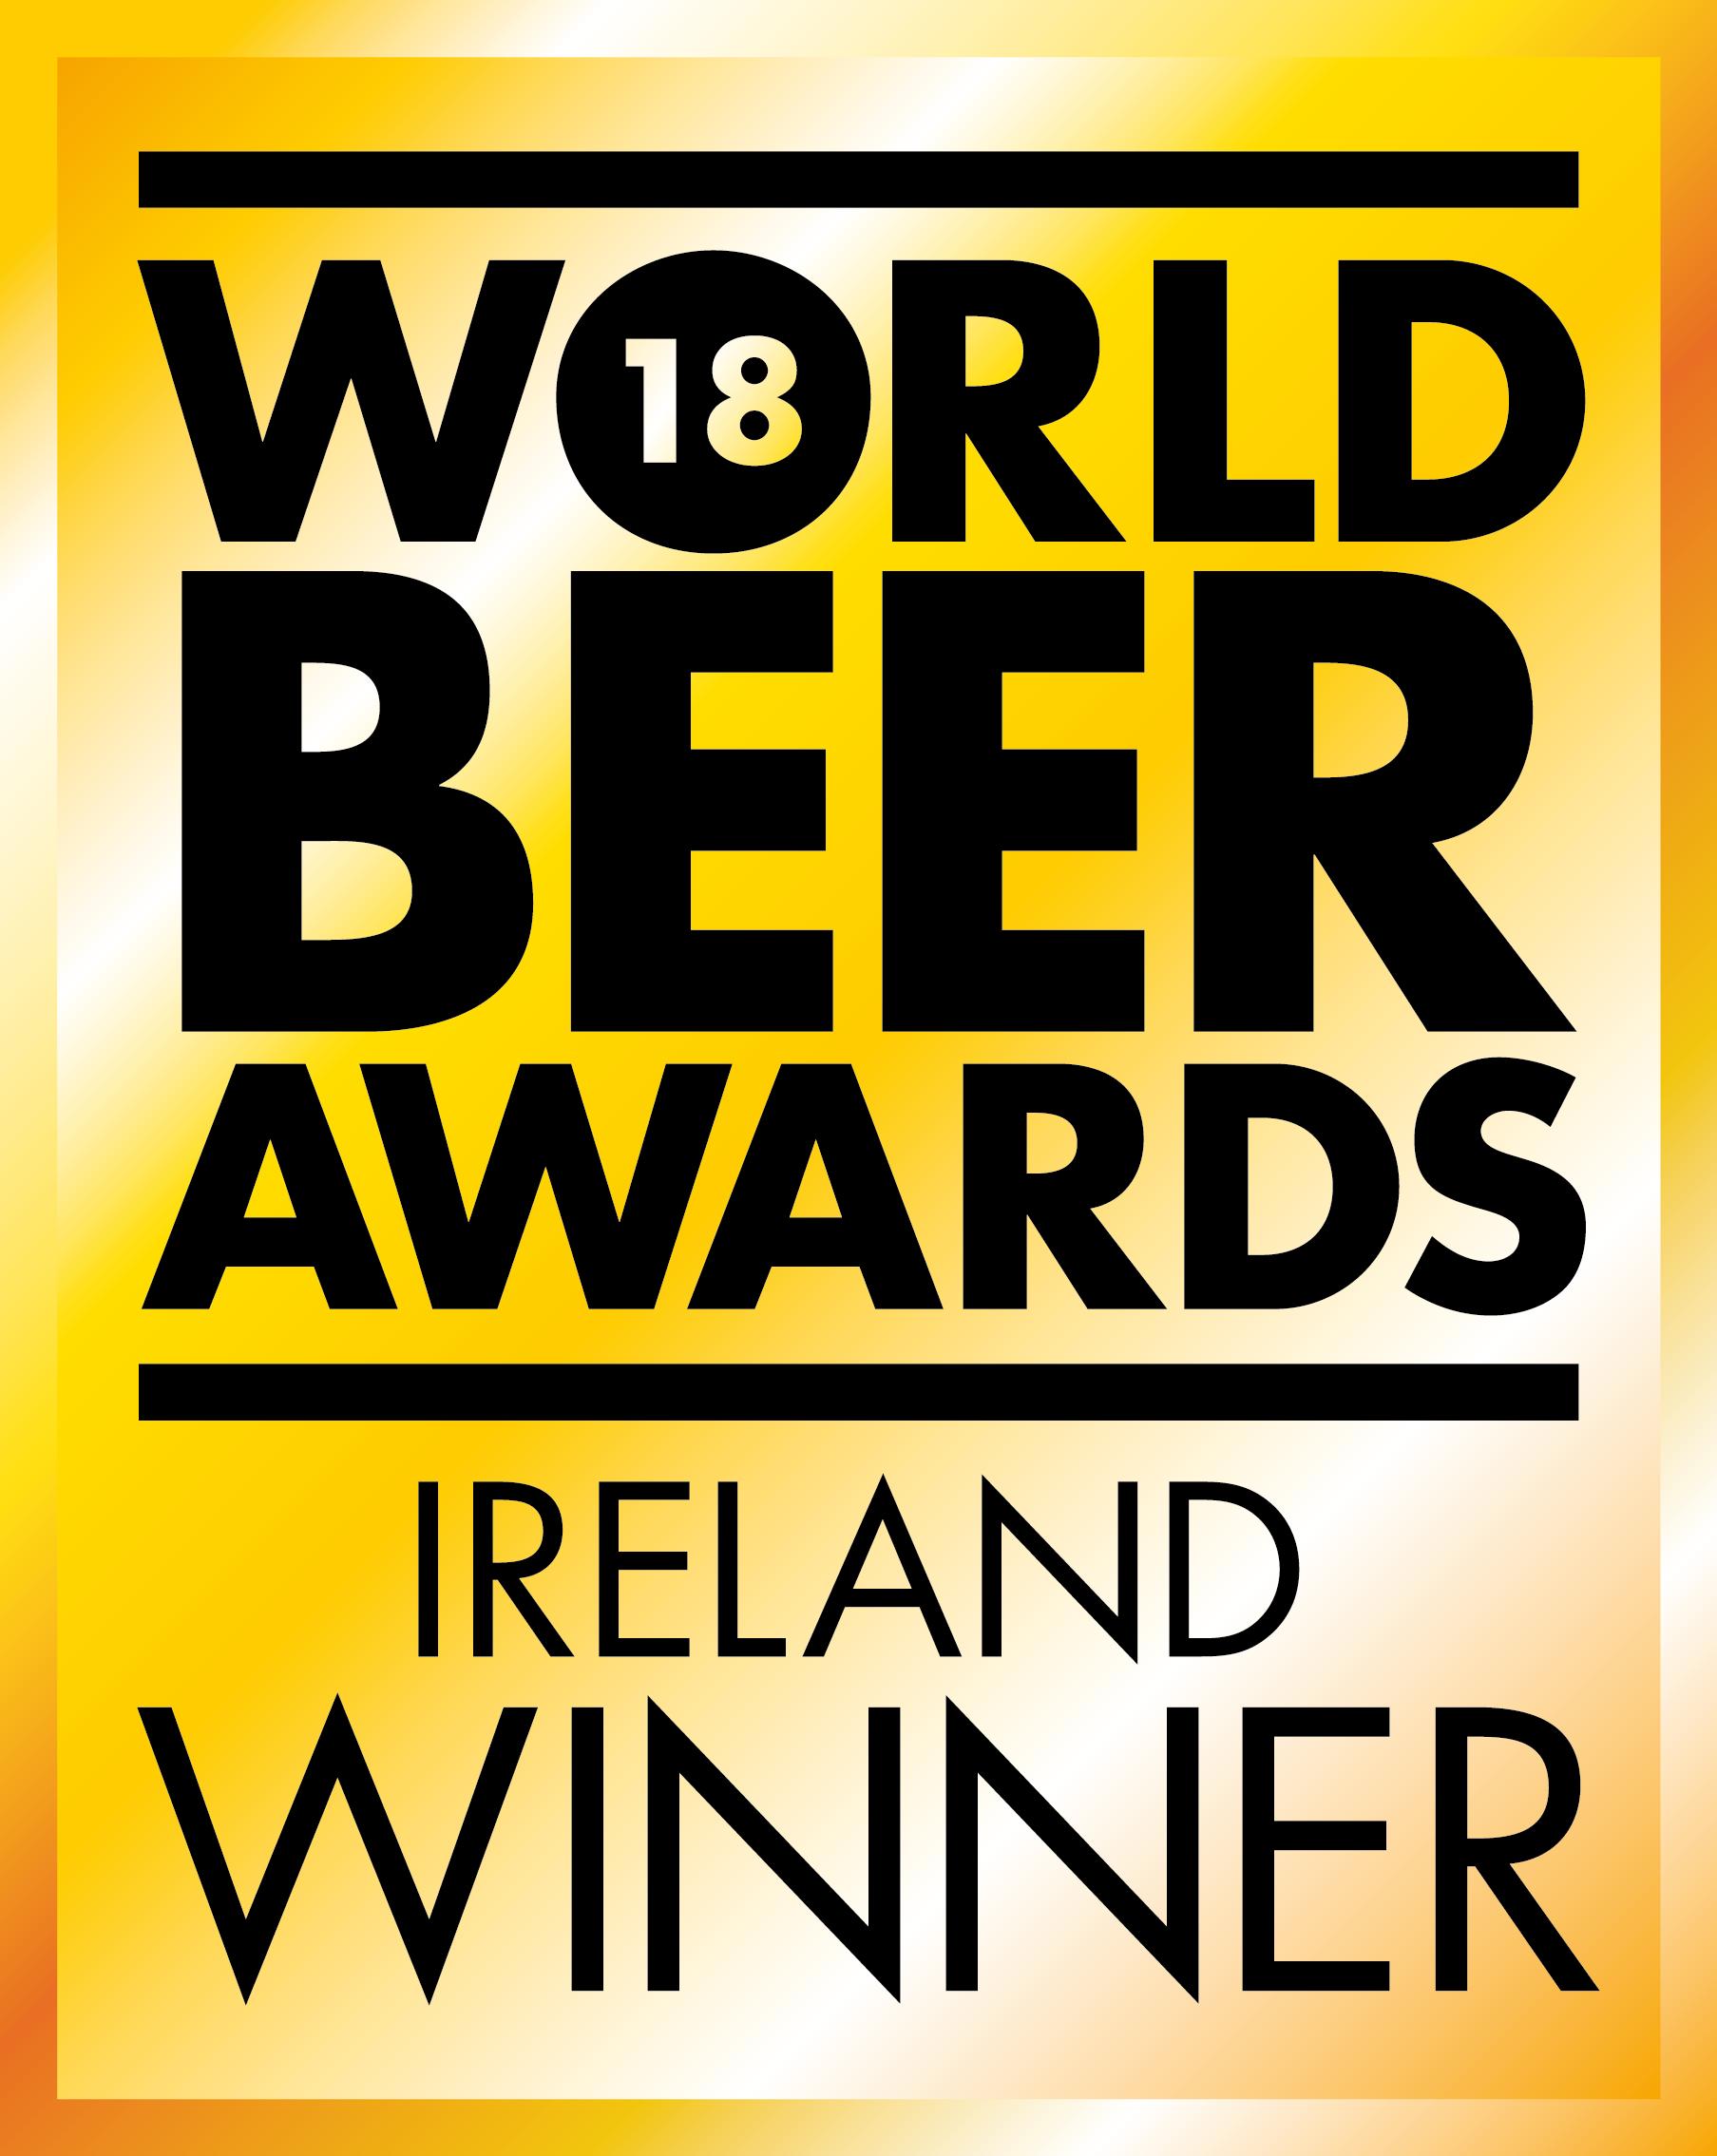 World Beer Awards 18 Ireland WINNER